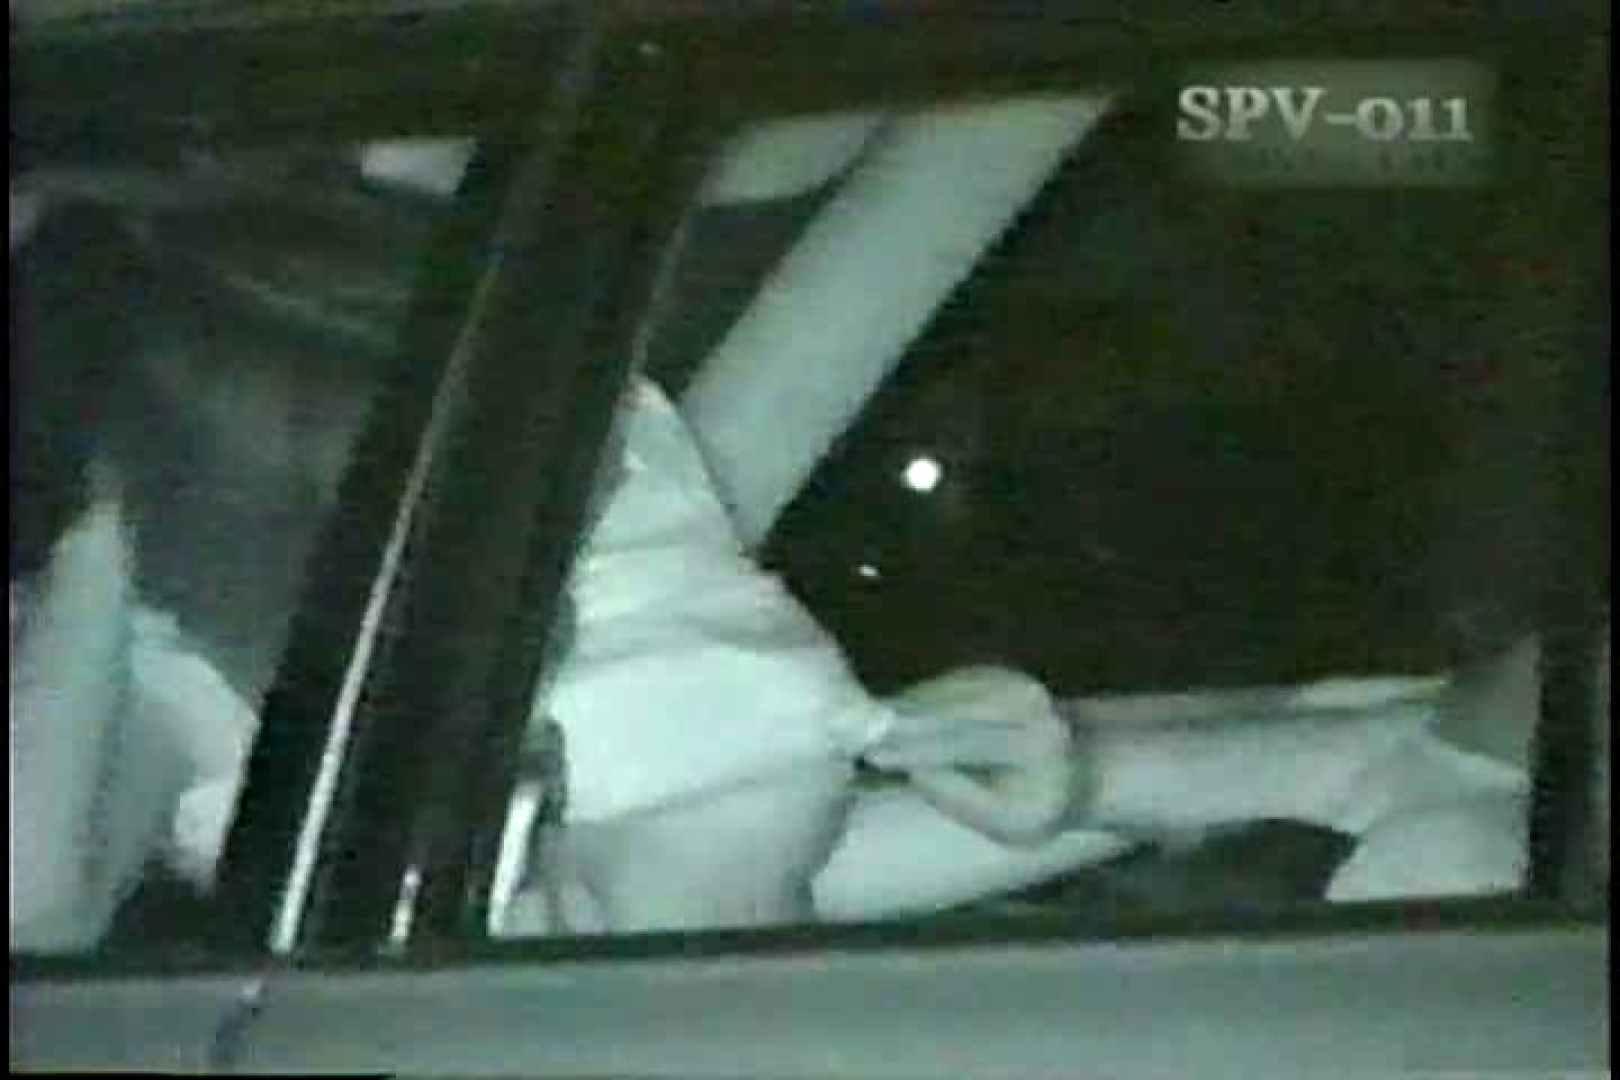 高画質版!SPD-011 盗撮 カーセックス黙示録 (VHS) 高画質 盗撮画像 107PIX 38